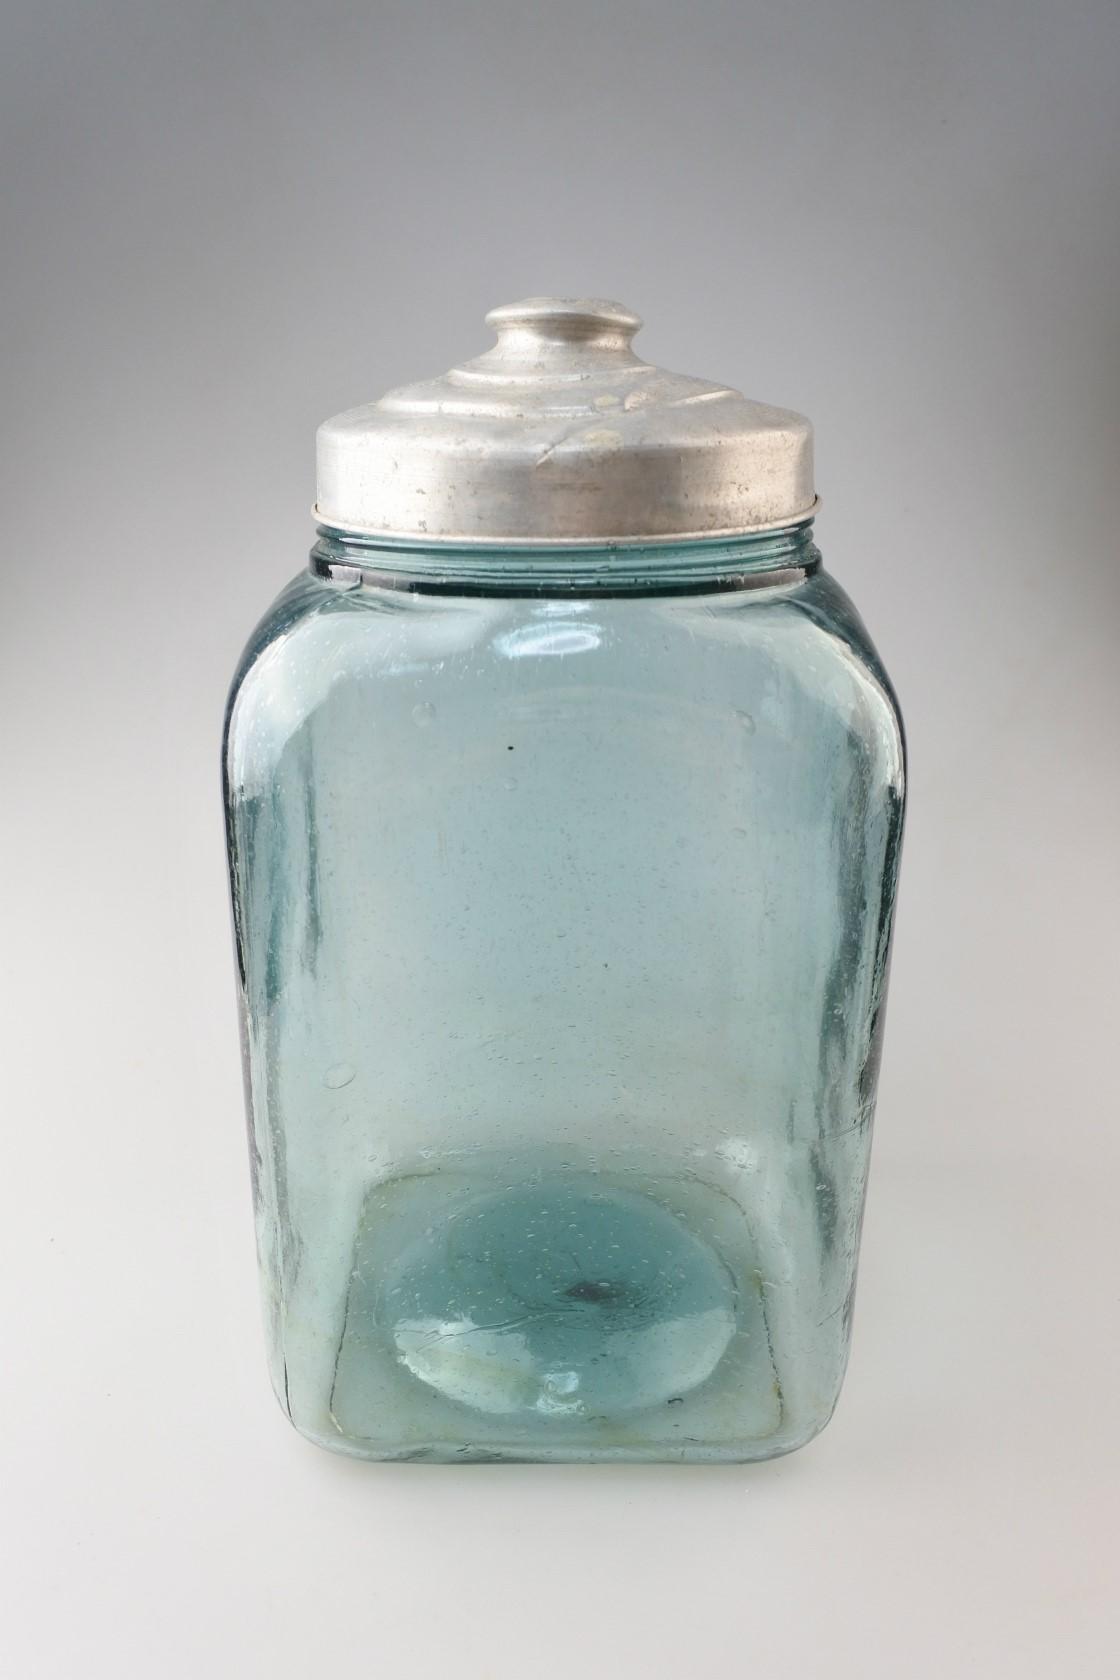 vi-seaweedbottleglass-b